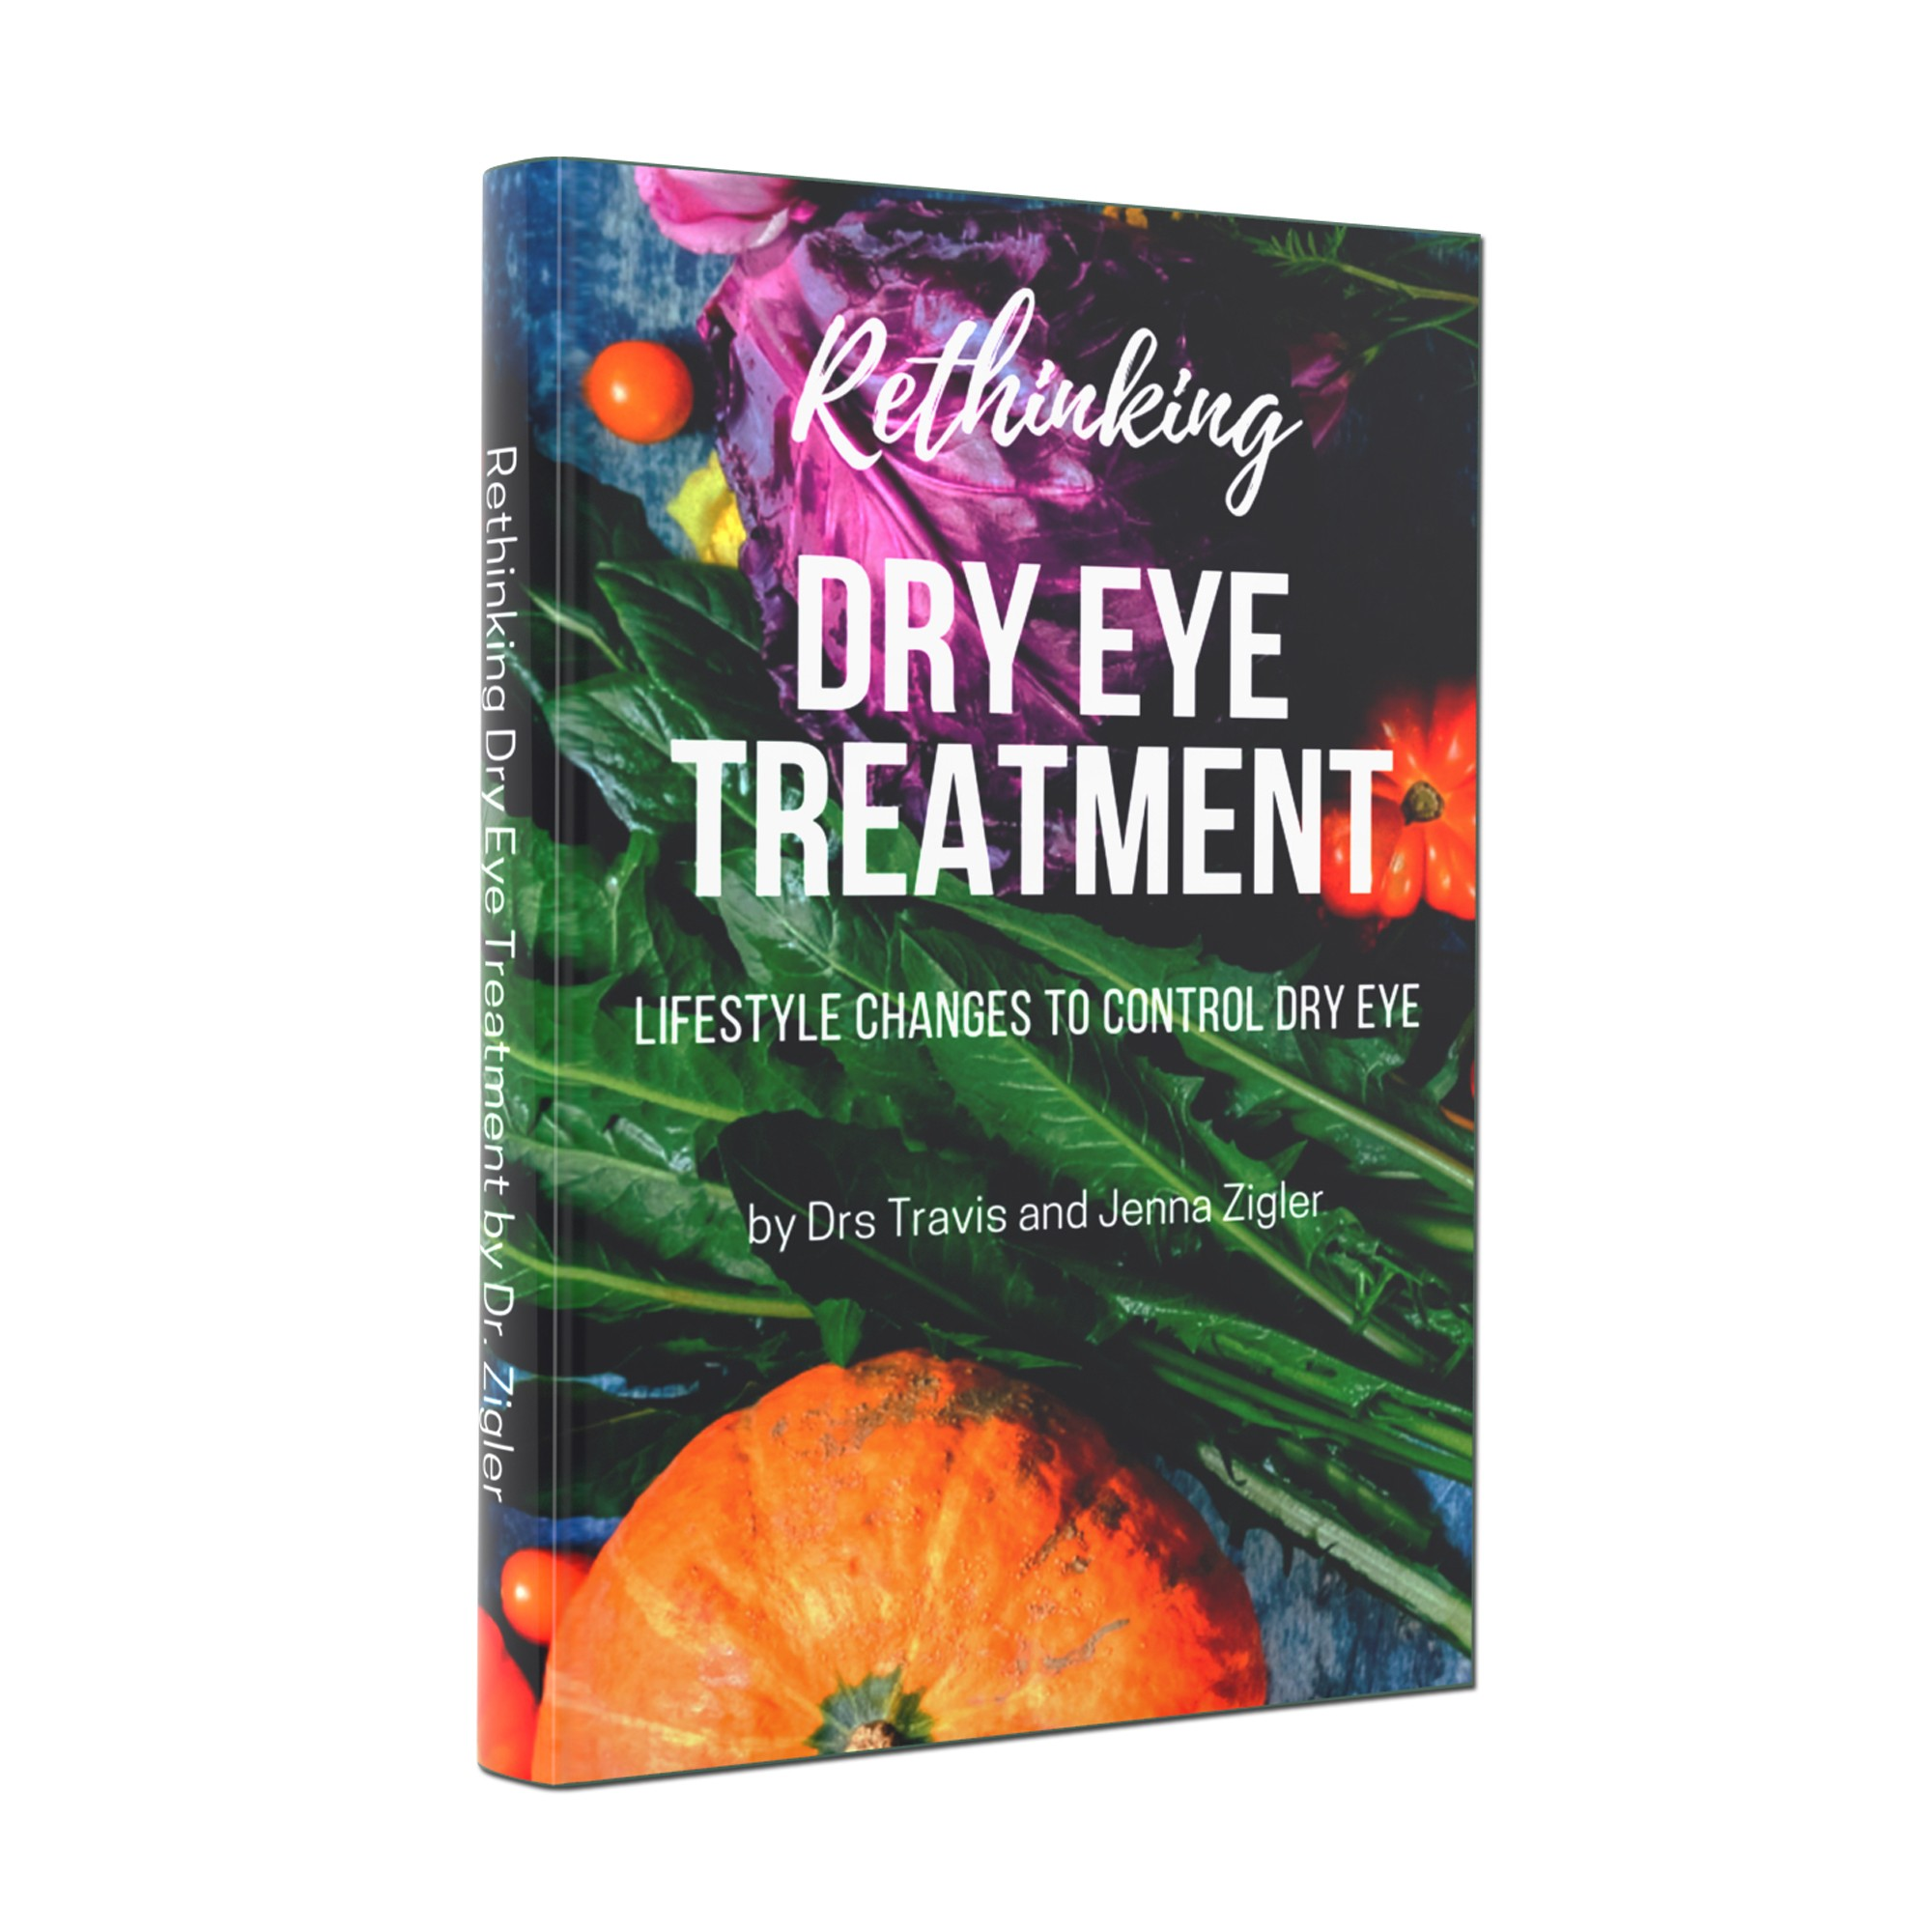 Rethinking Dry Eye Treatment Book by Dr. Travis Zigler